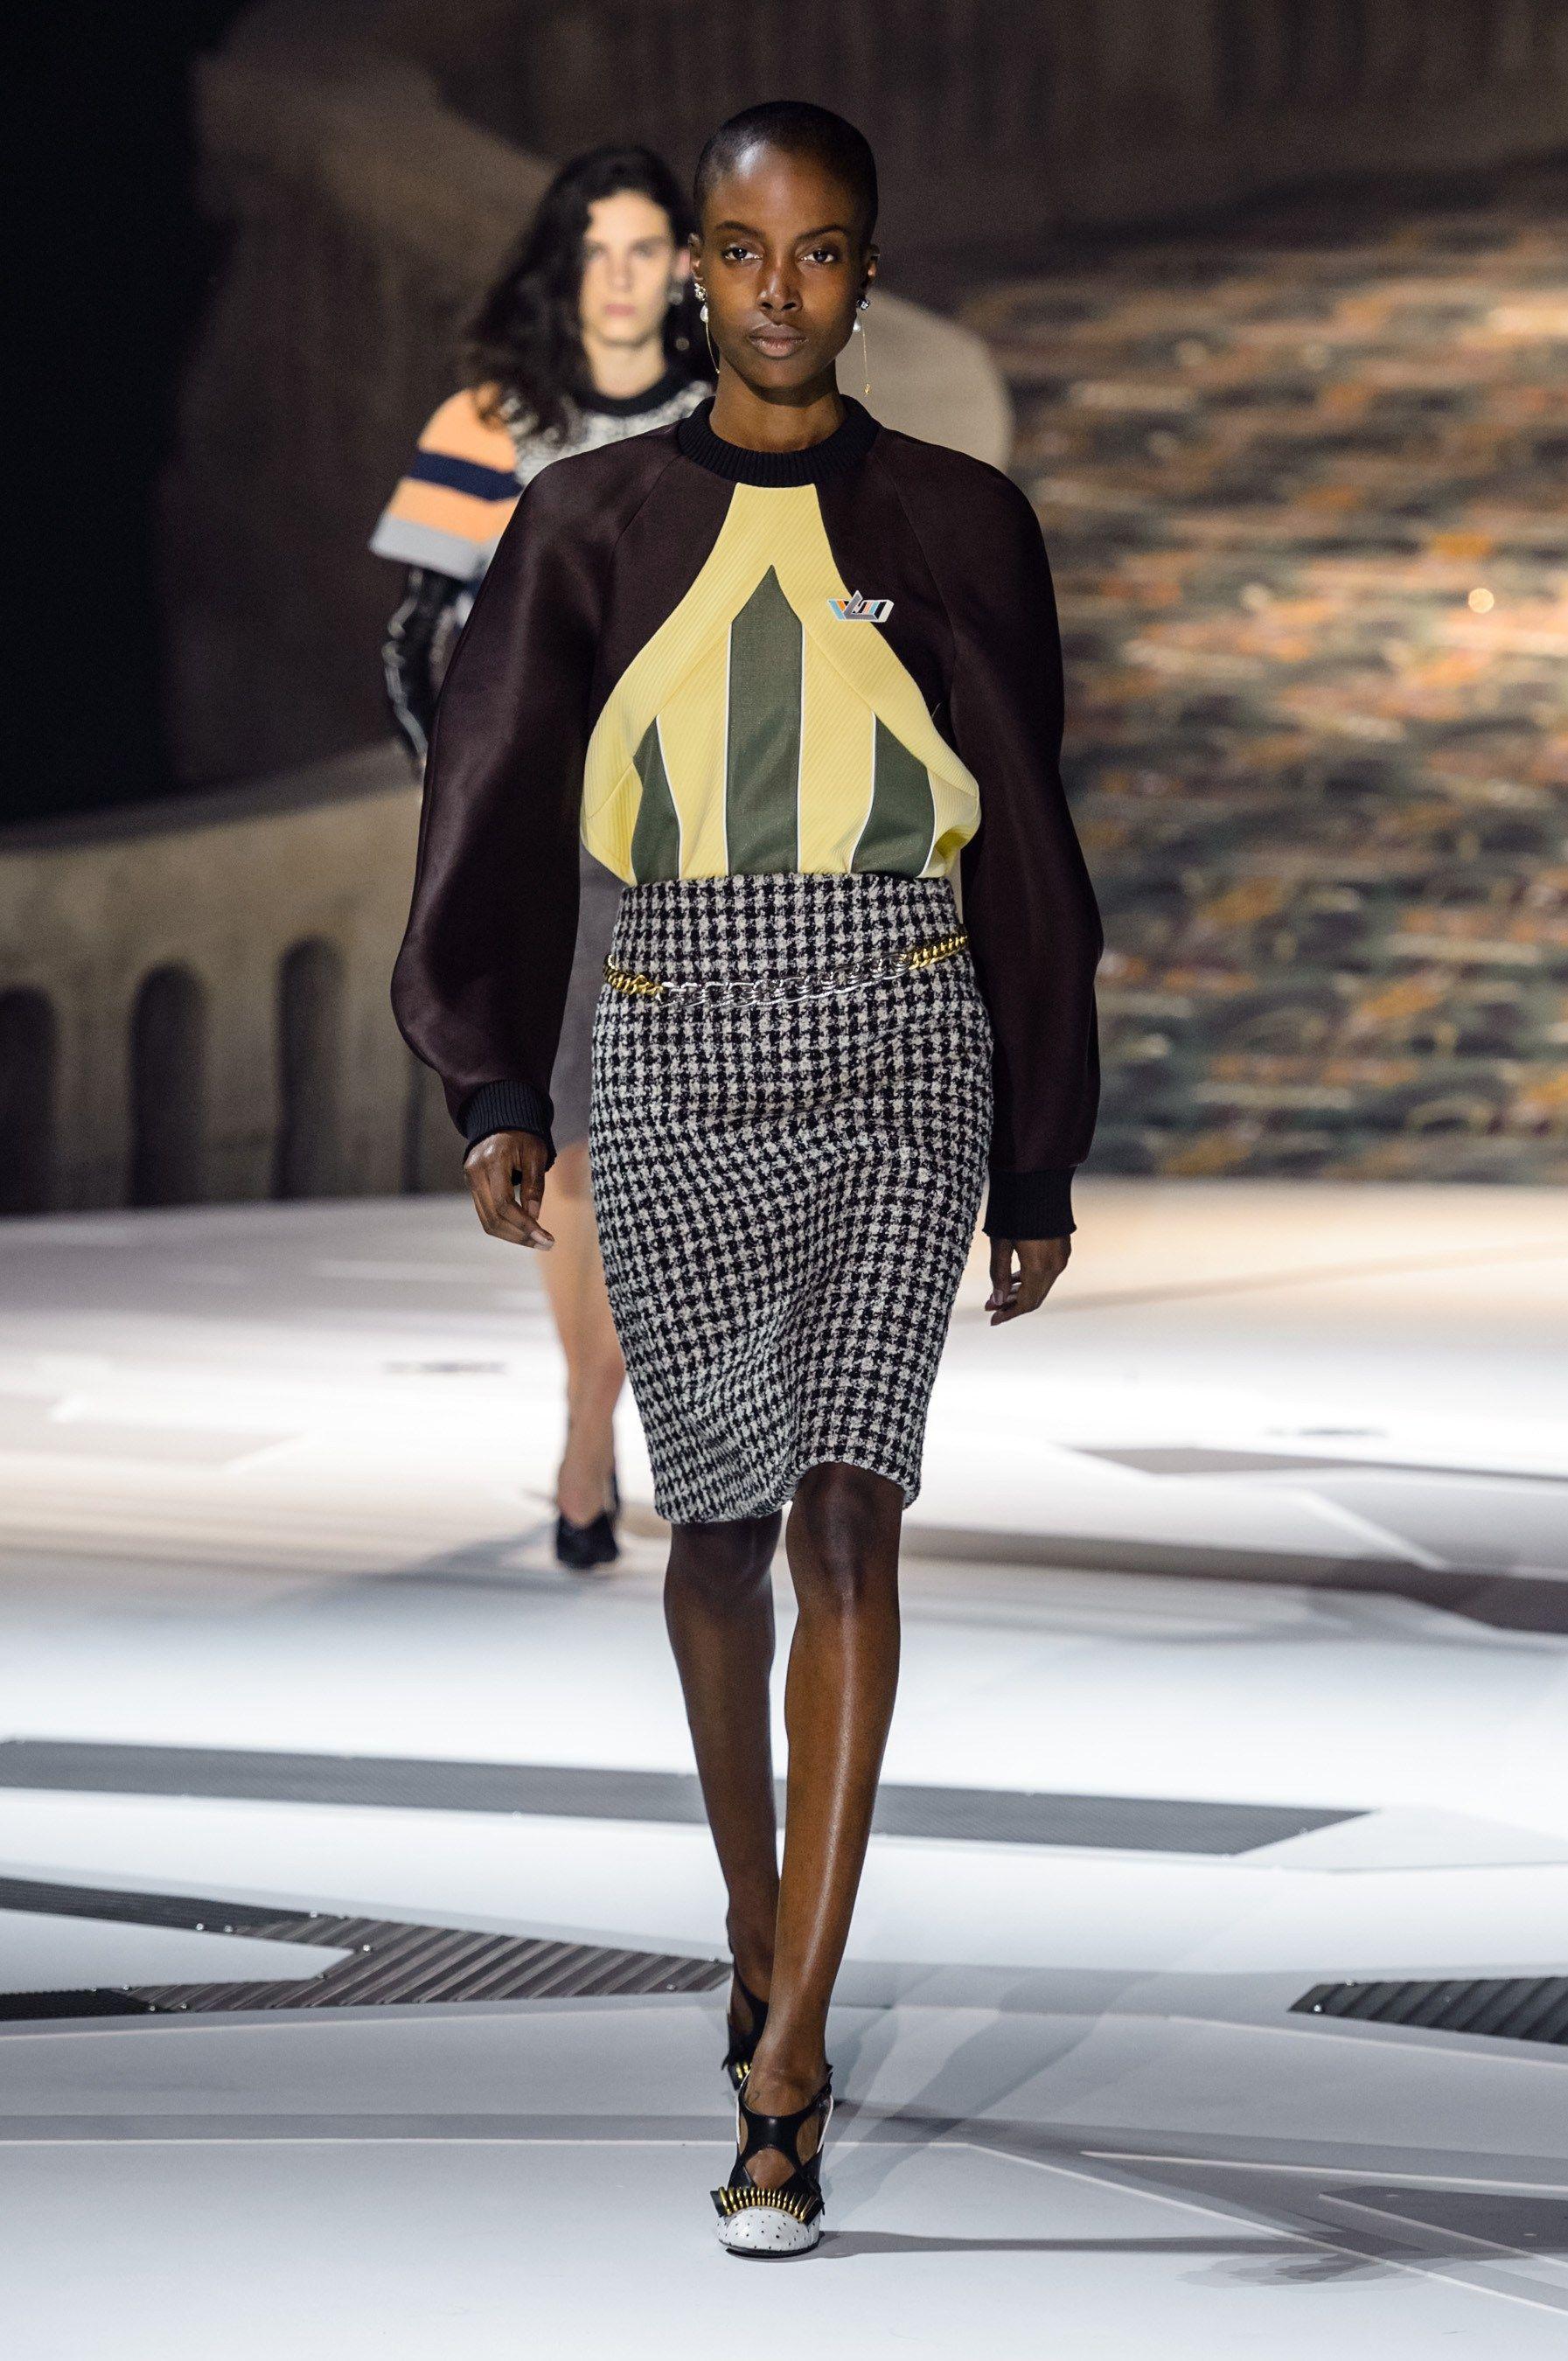 Chanel fashion show 2018 video 2